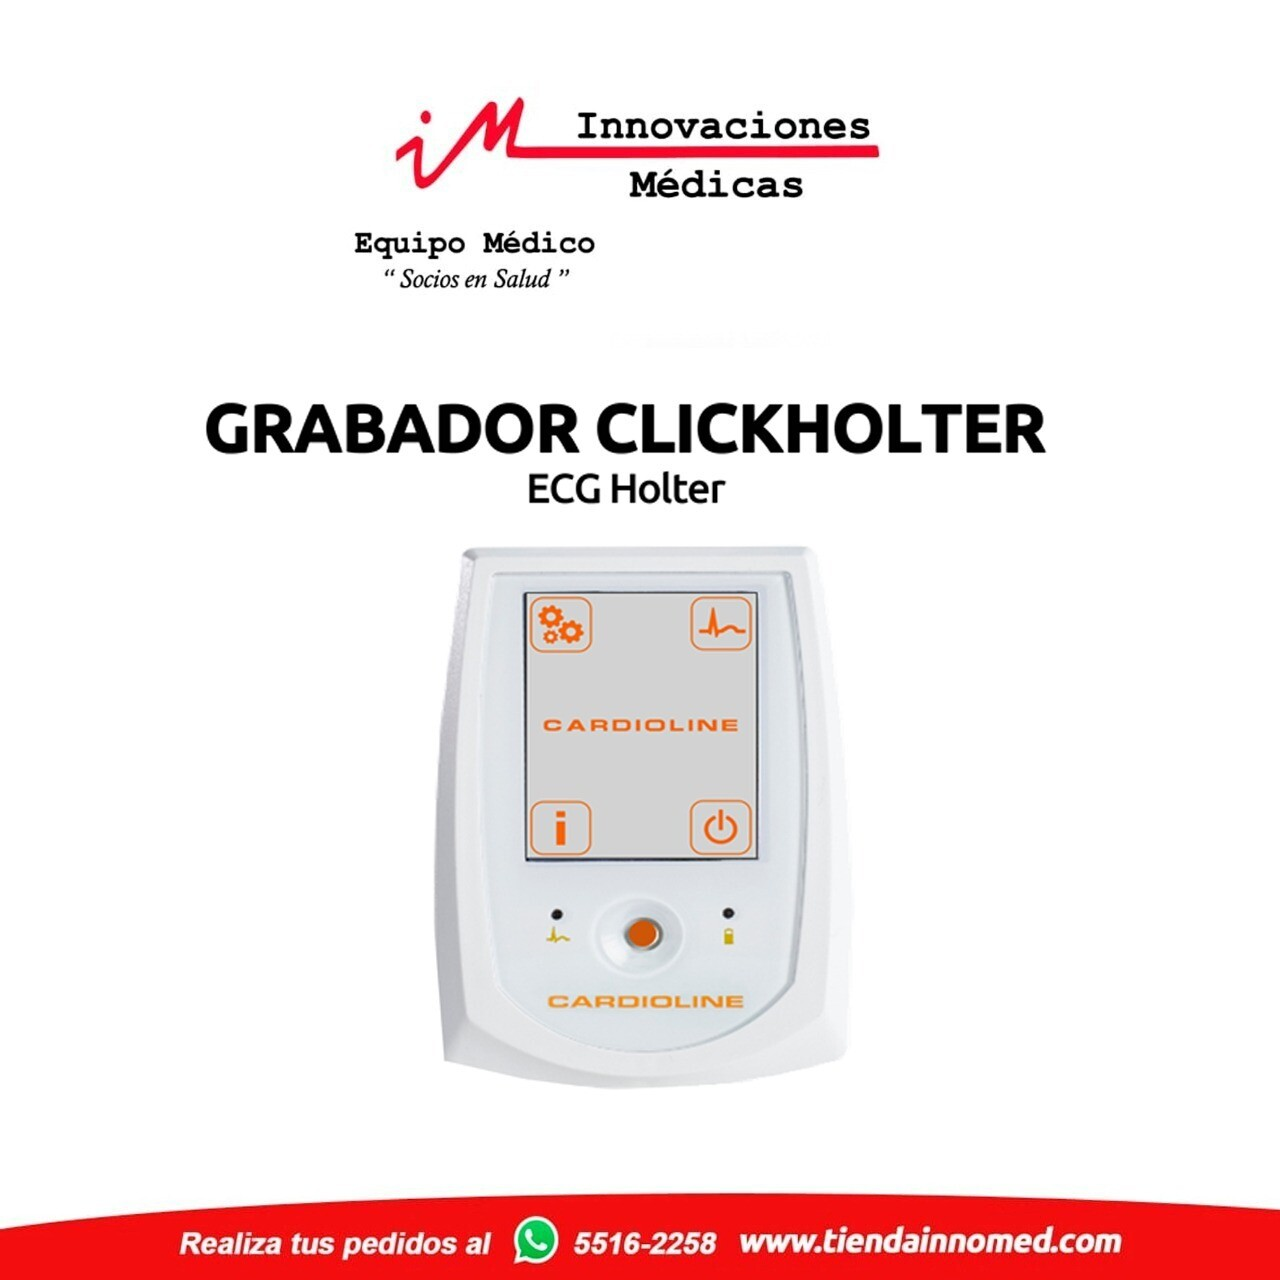 Clickholter Grabador ECG Holter